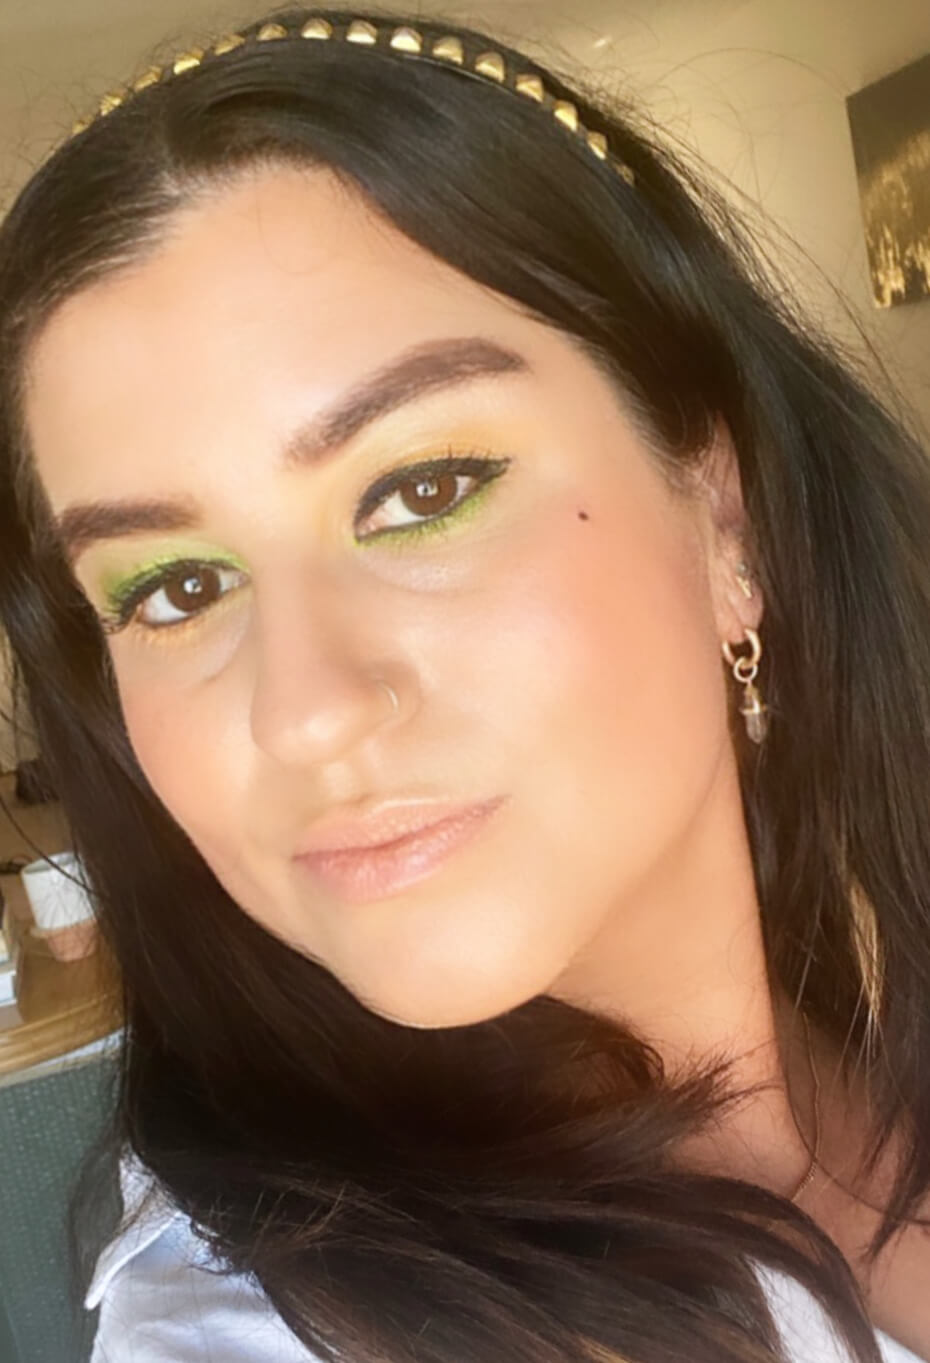 senegence-color-surge-makeup-look-073120-2